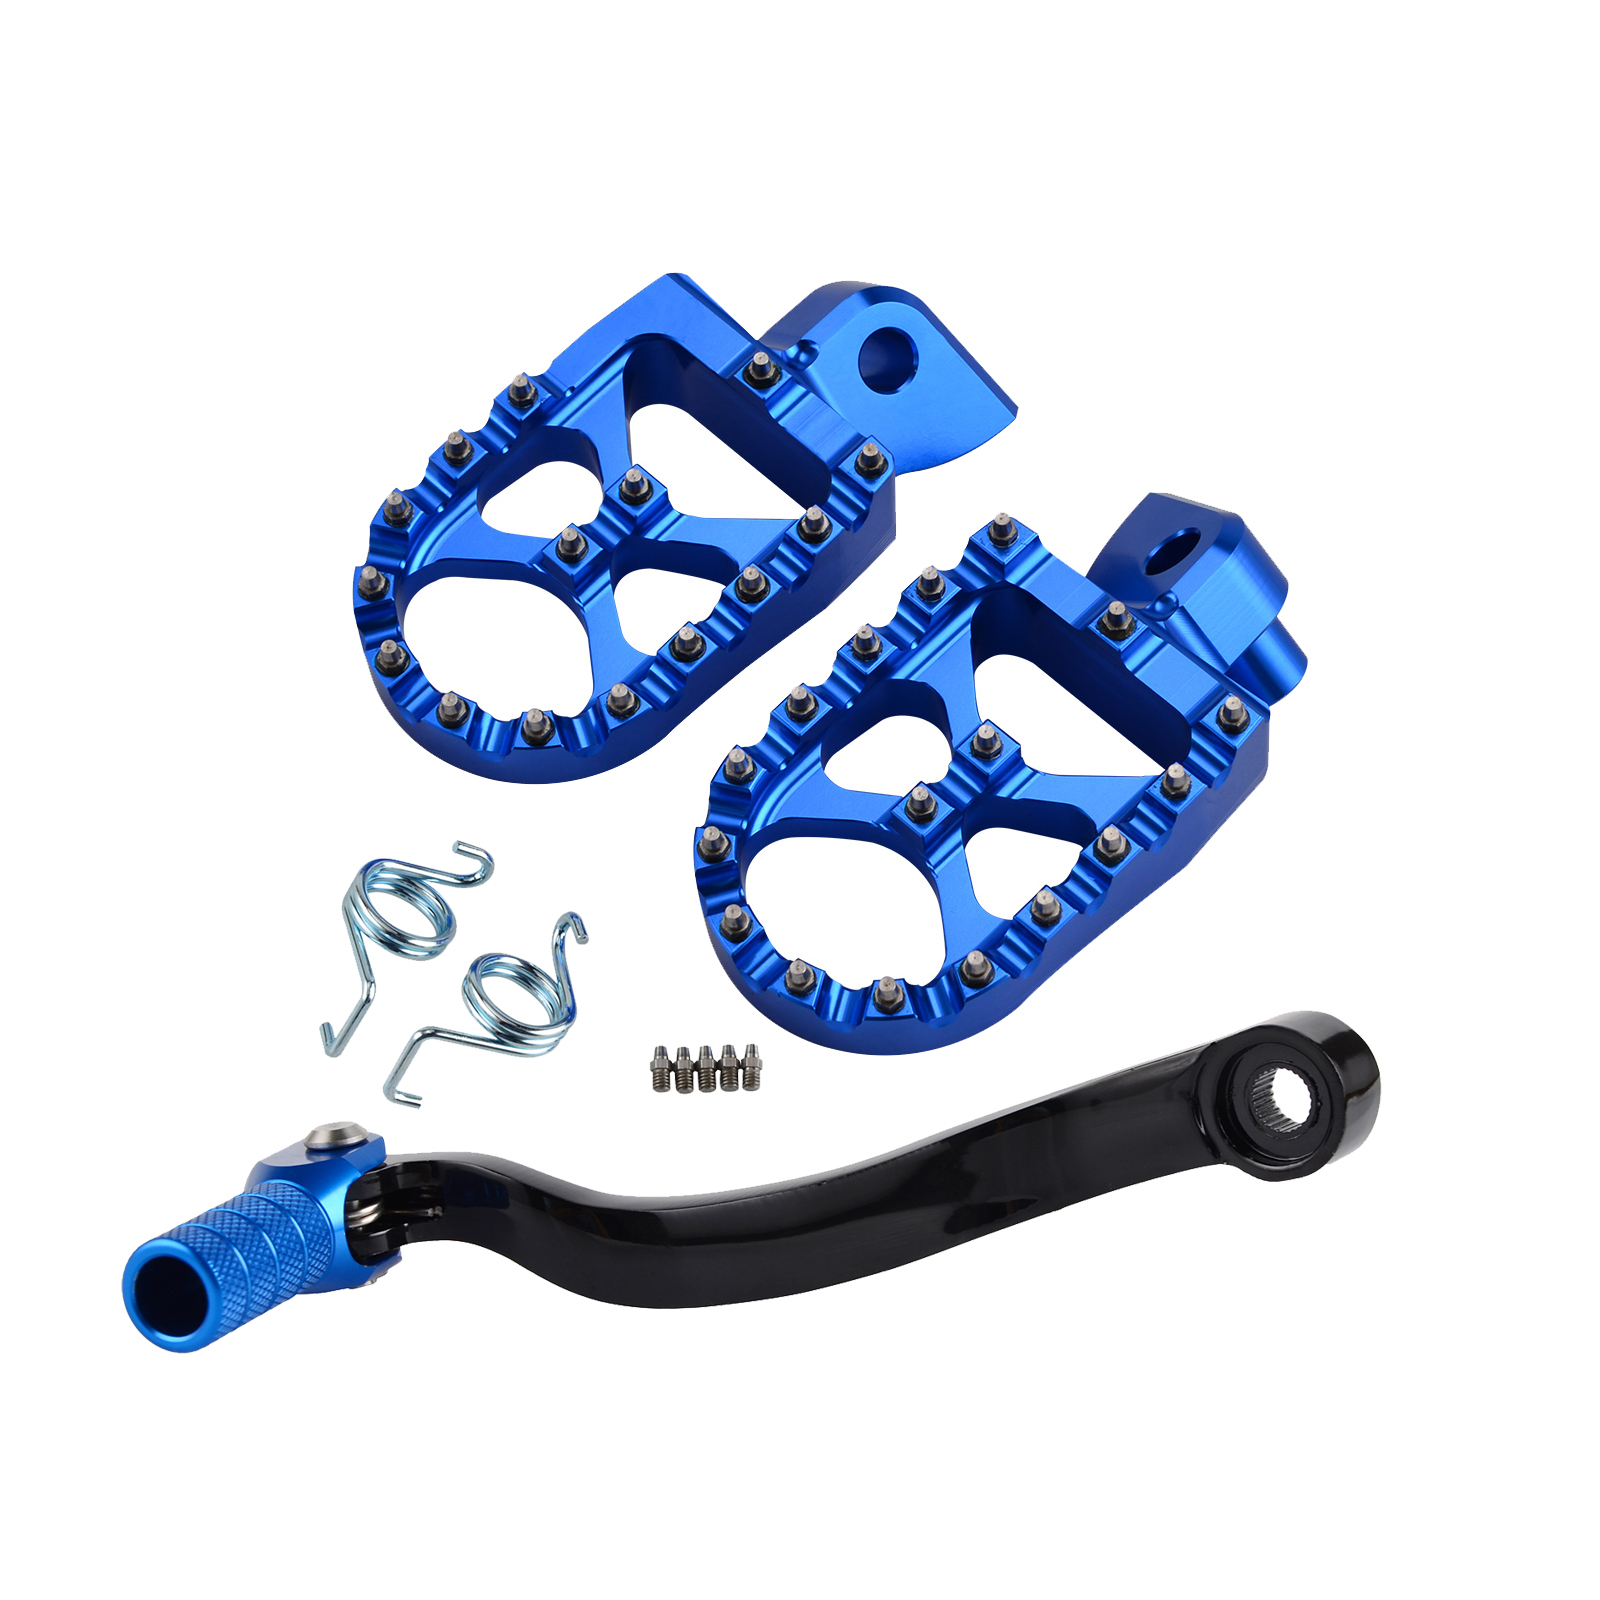 H2CNC Gear Shift Foot Lever Folding Tip Foot Pegs Rest Footpeg Pedals Rear Sets For Husqvarna TC125 FC250 FC350 2014-2015 Billet